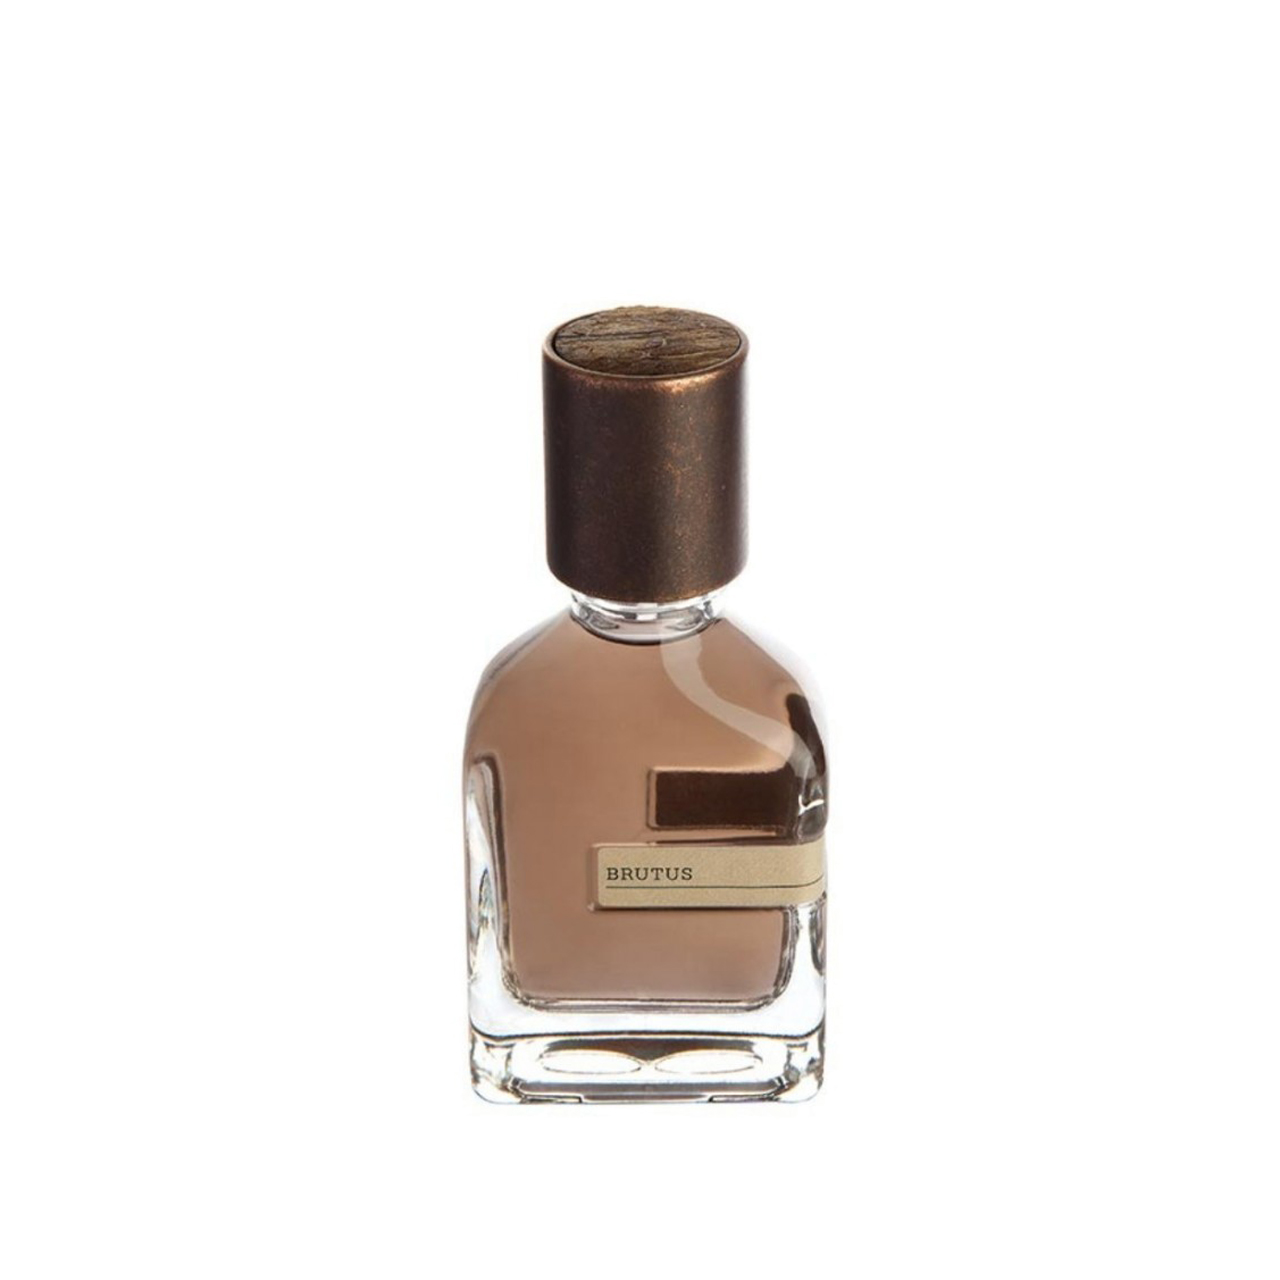 Brutus - Eau de Parfum